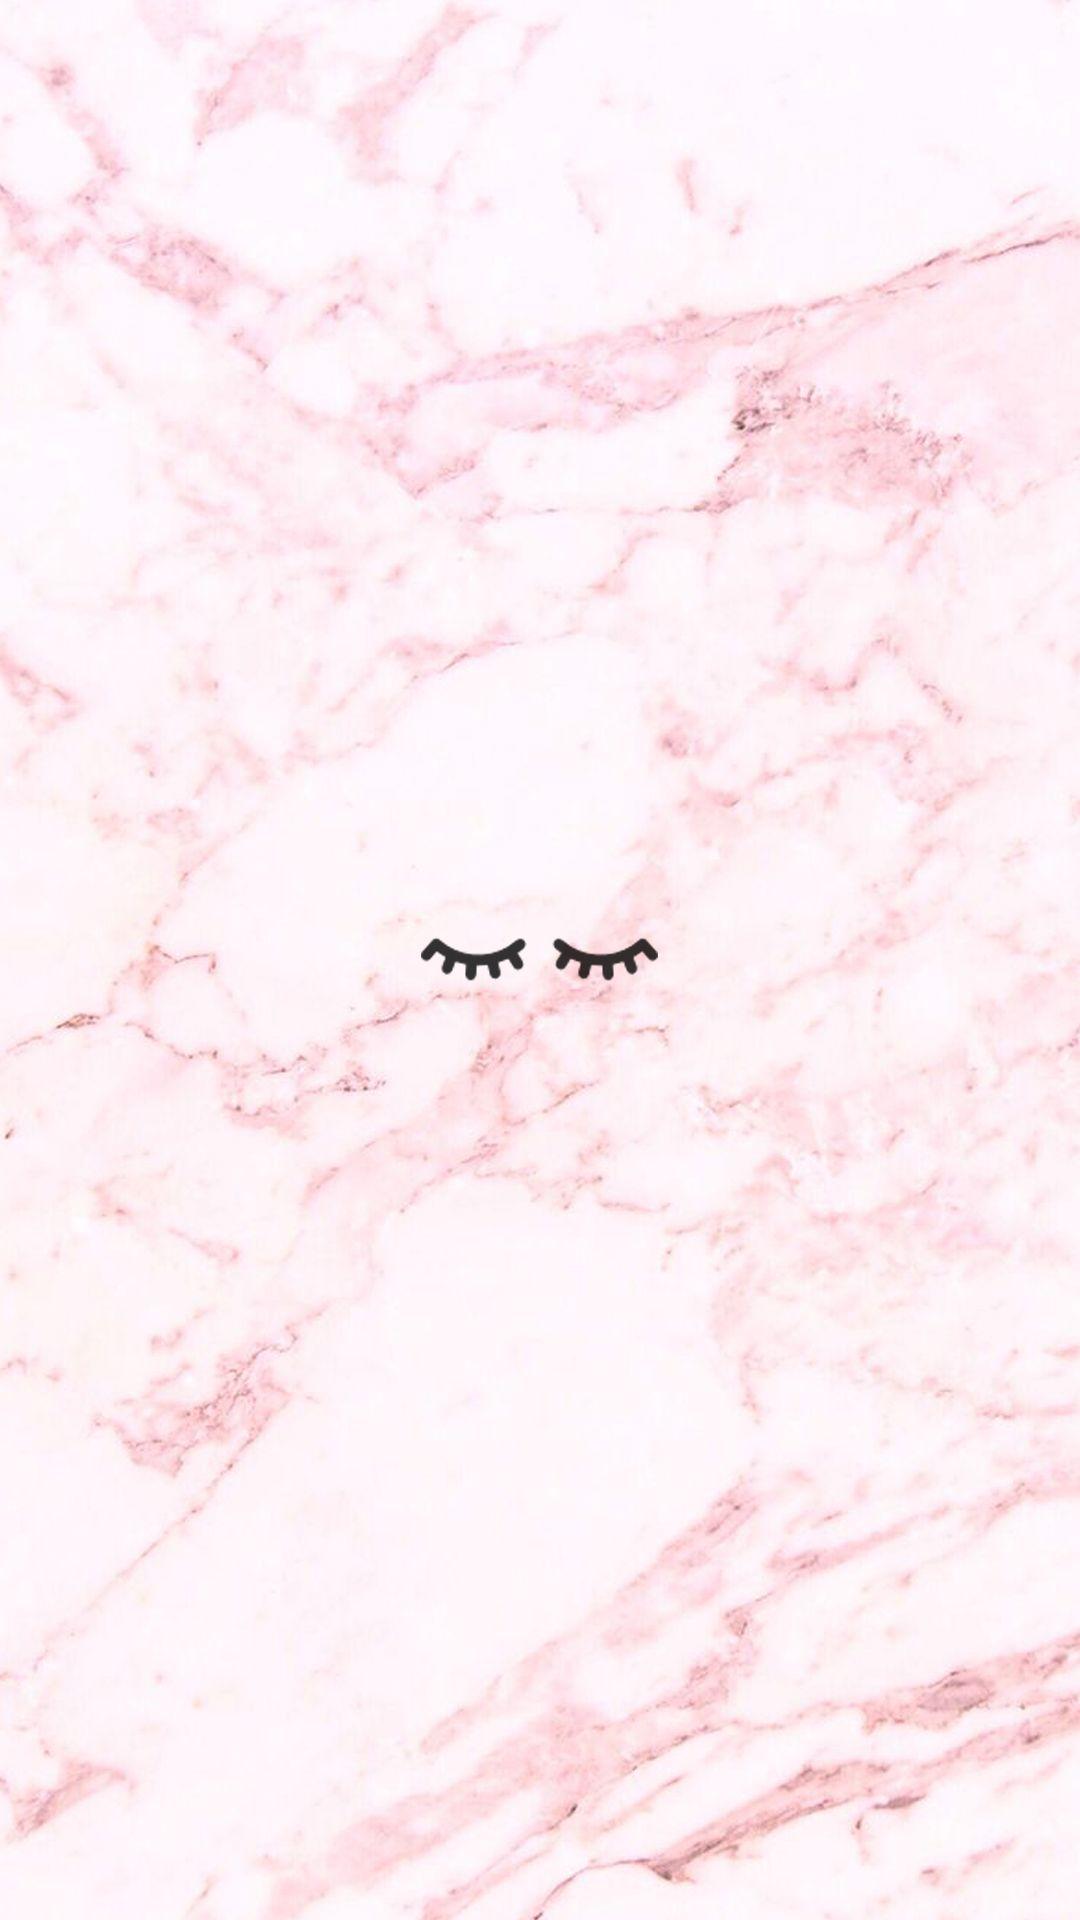 Summer Break 2019 Tumblr achtergronden, Wallpaper